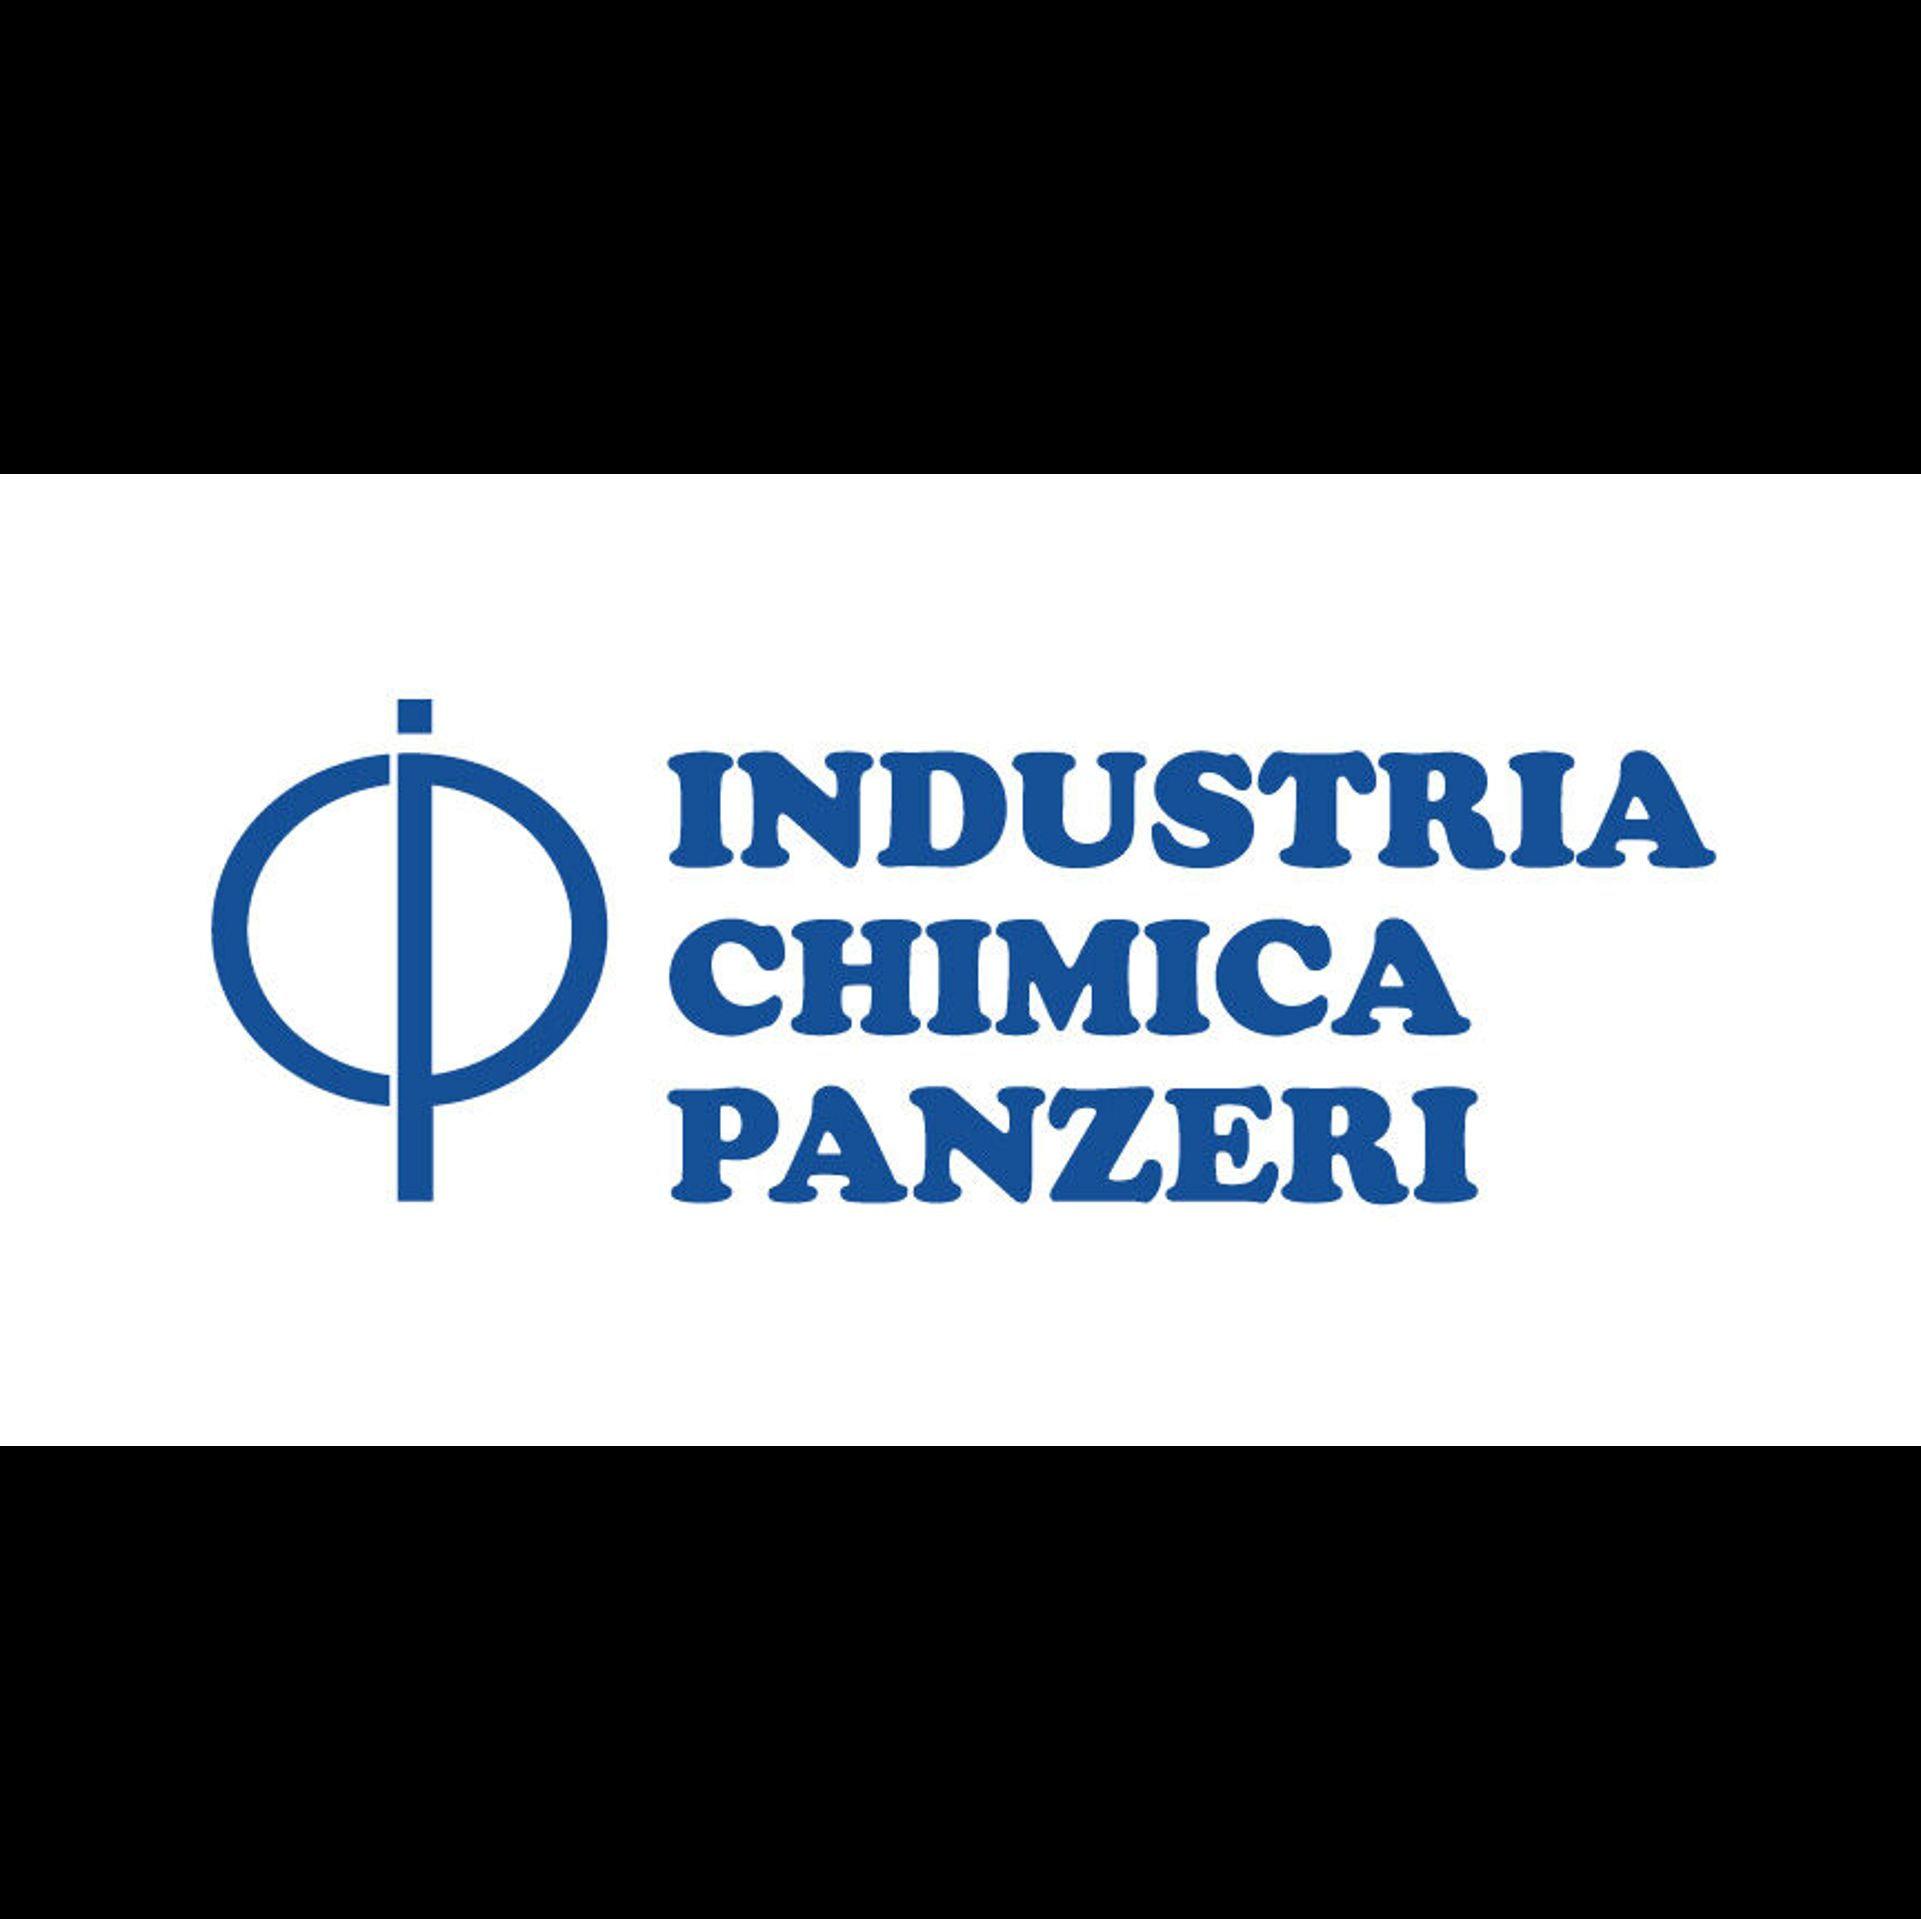 Sponsor tony arbolino, Industria Chimica Panzeri